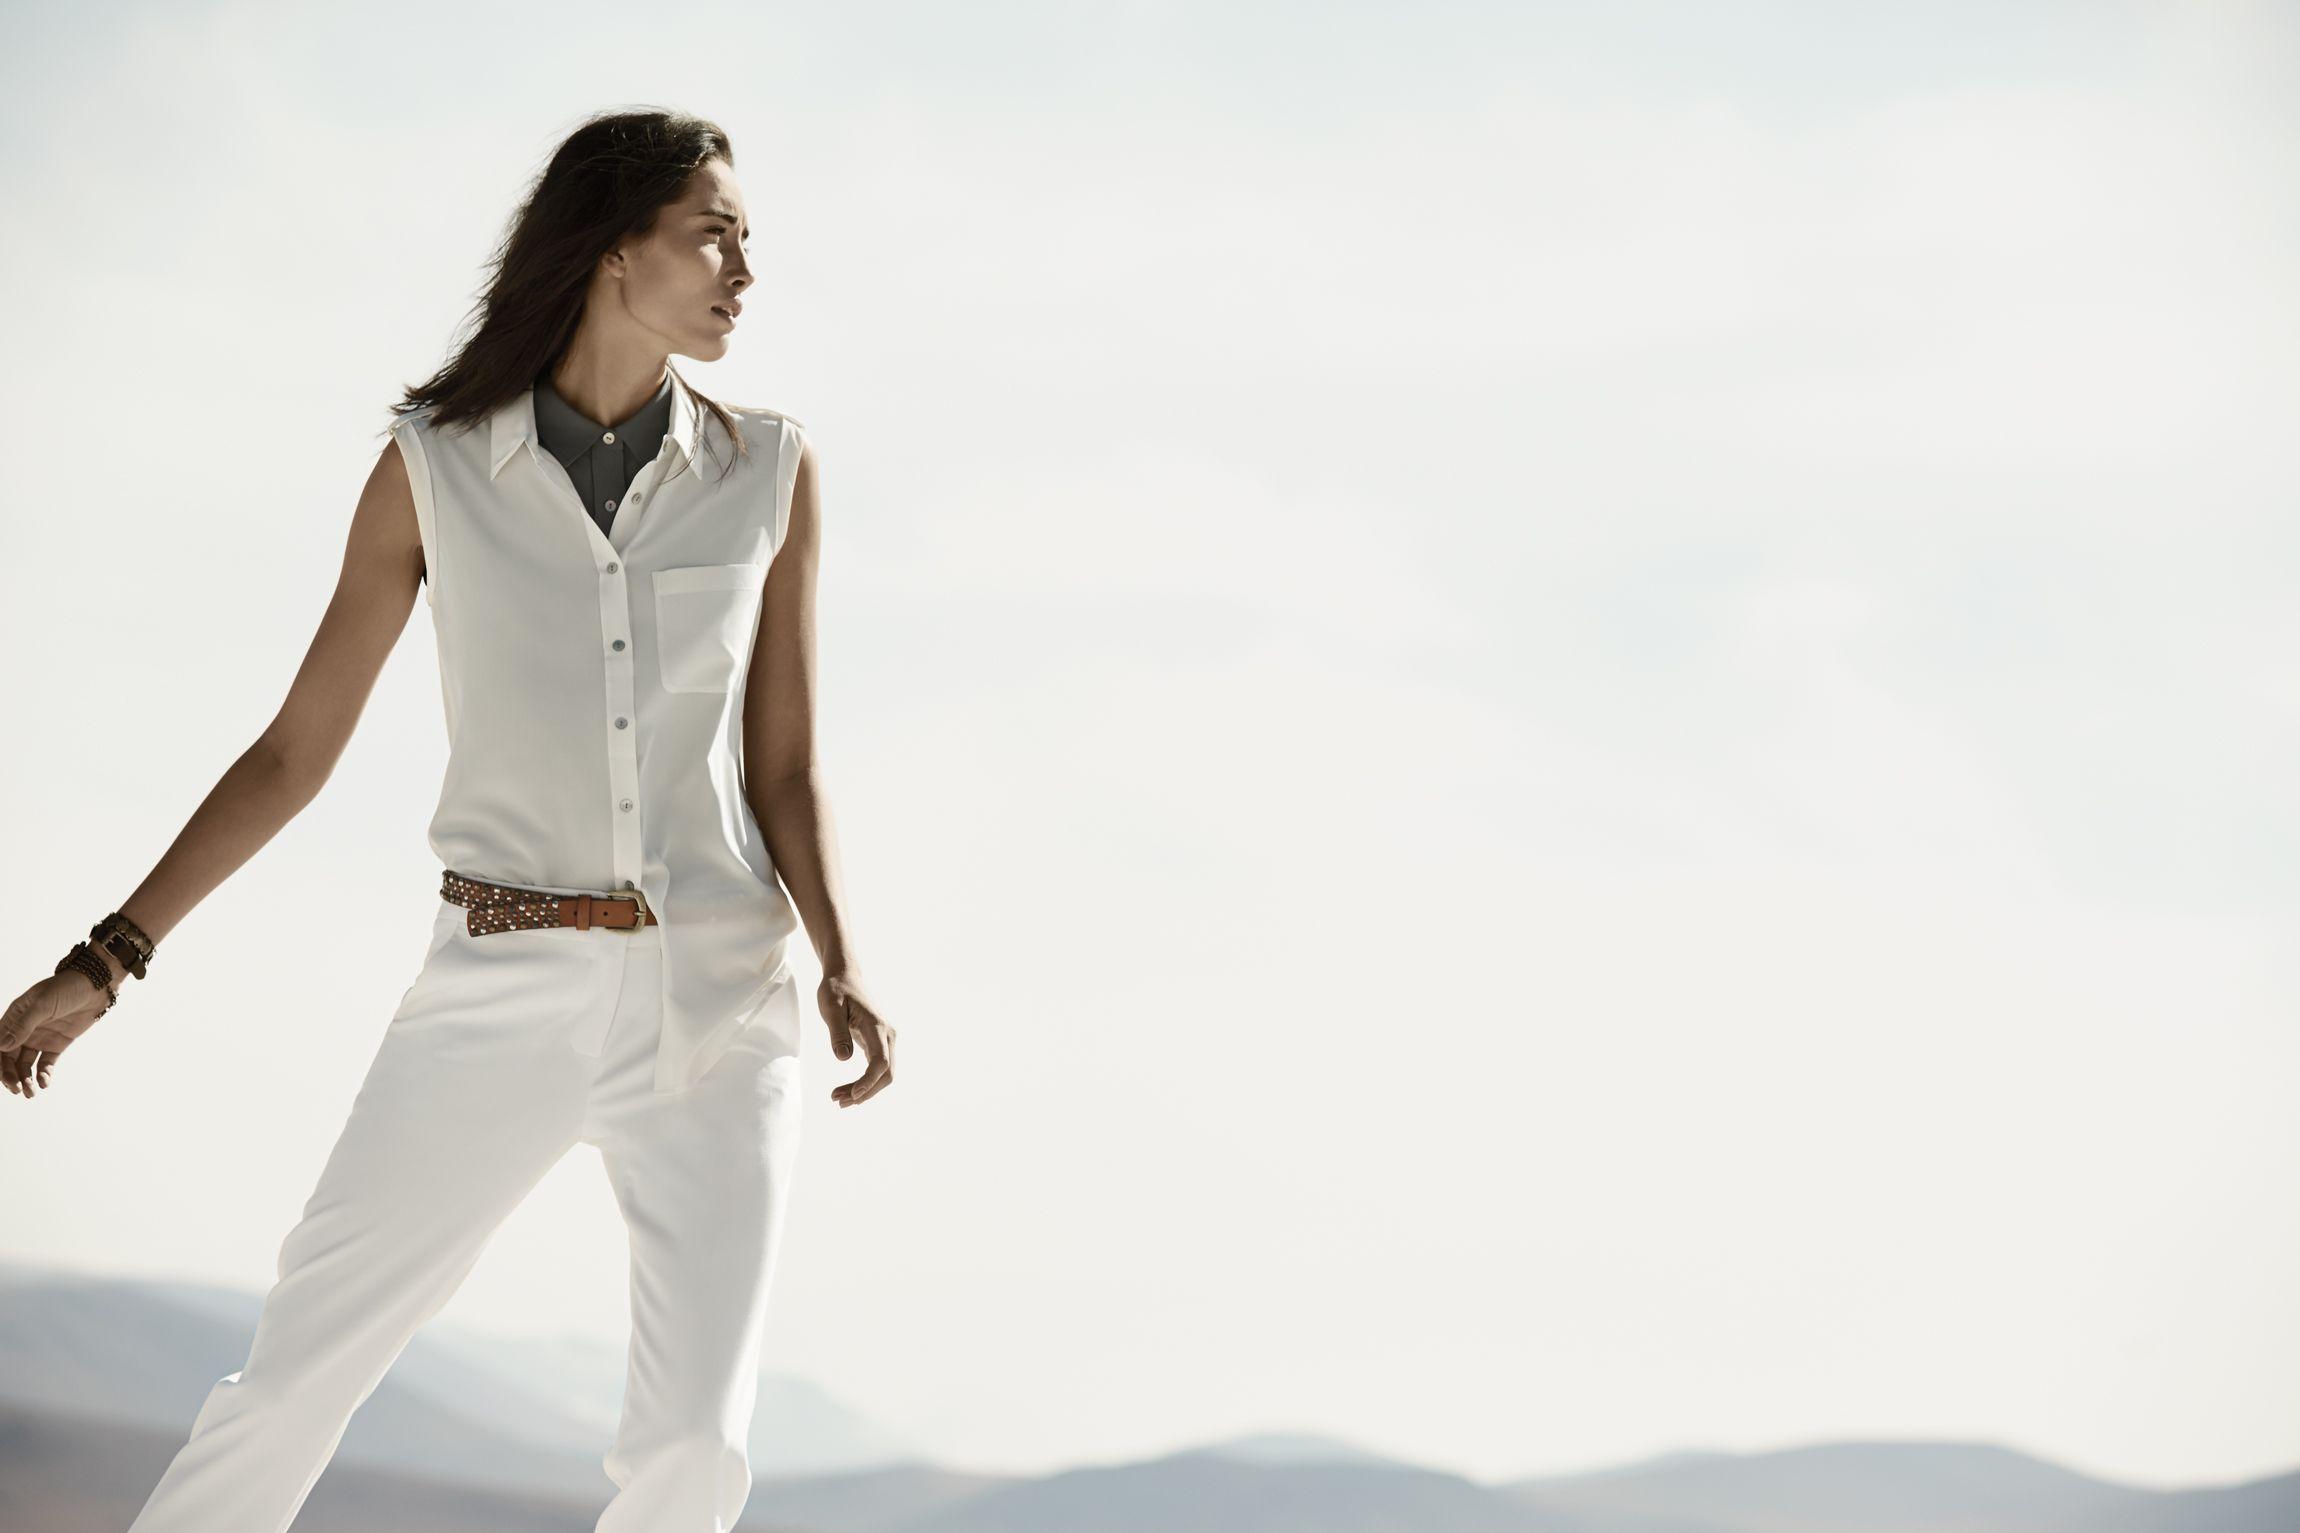 #atacama #desert #white #look